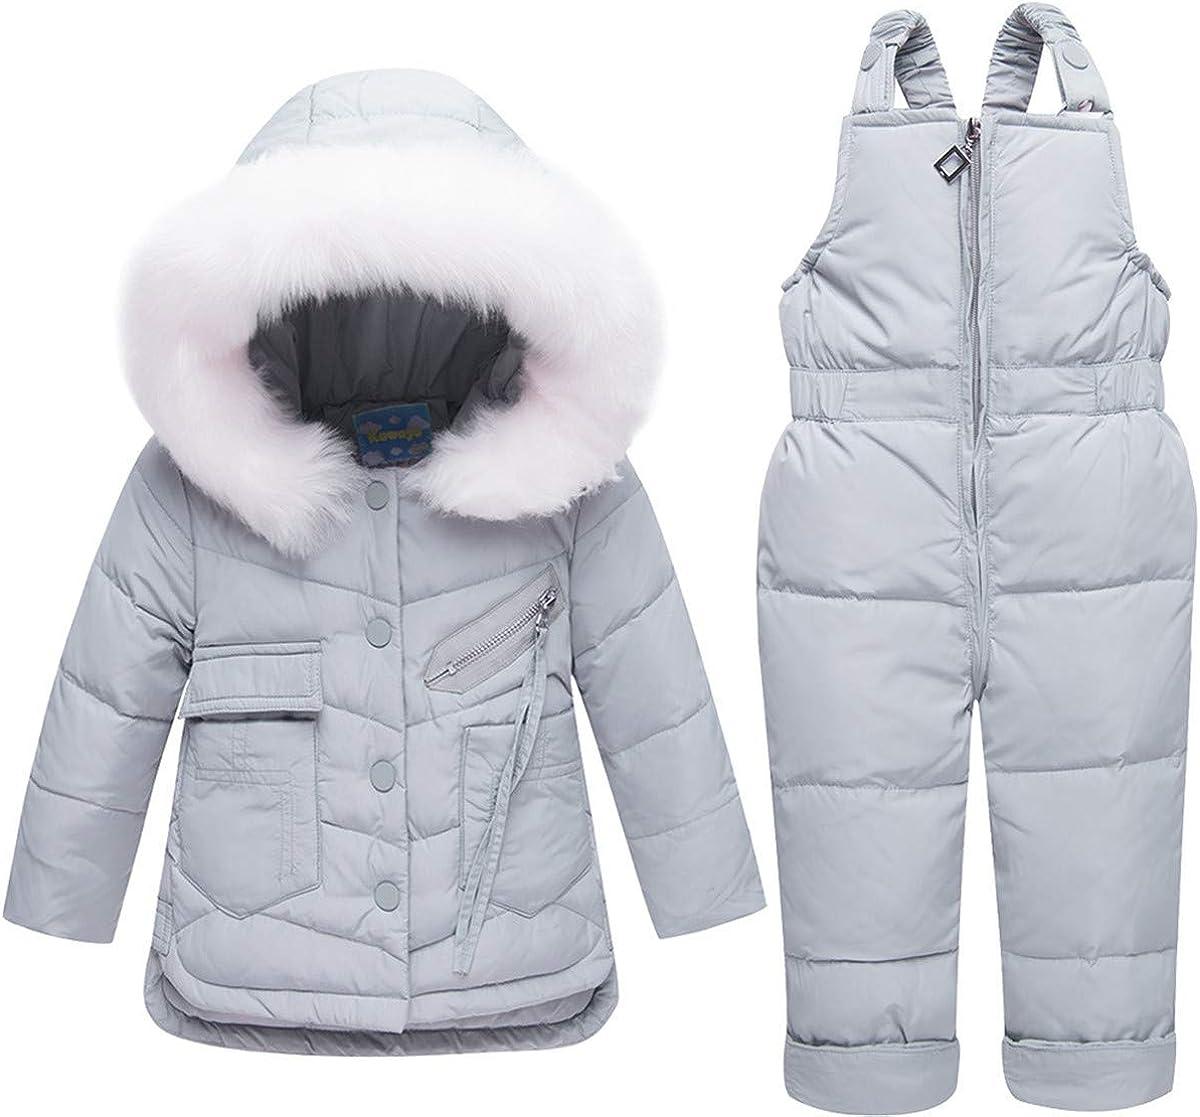 REWANGOING Baby Kids Girls Winter Warm Fur Trim Sweety Pocket Hooded Puffer Down Jacket Snowsuit with Ski Bib Pants Set